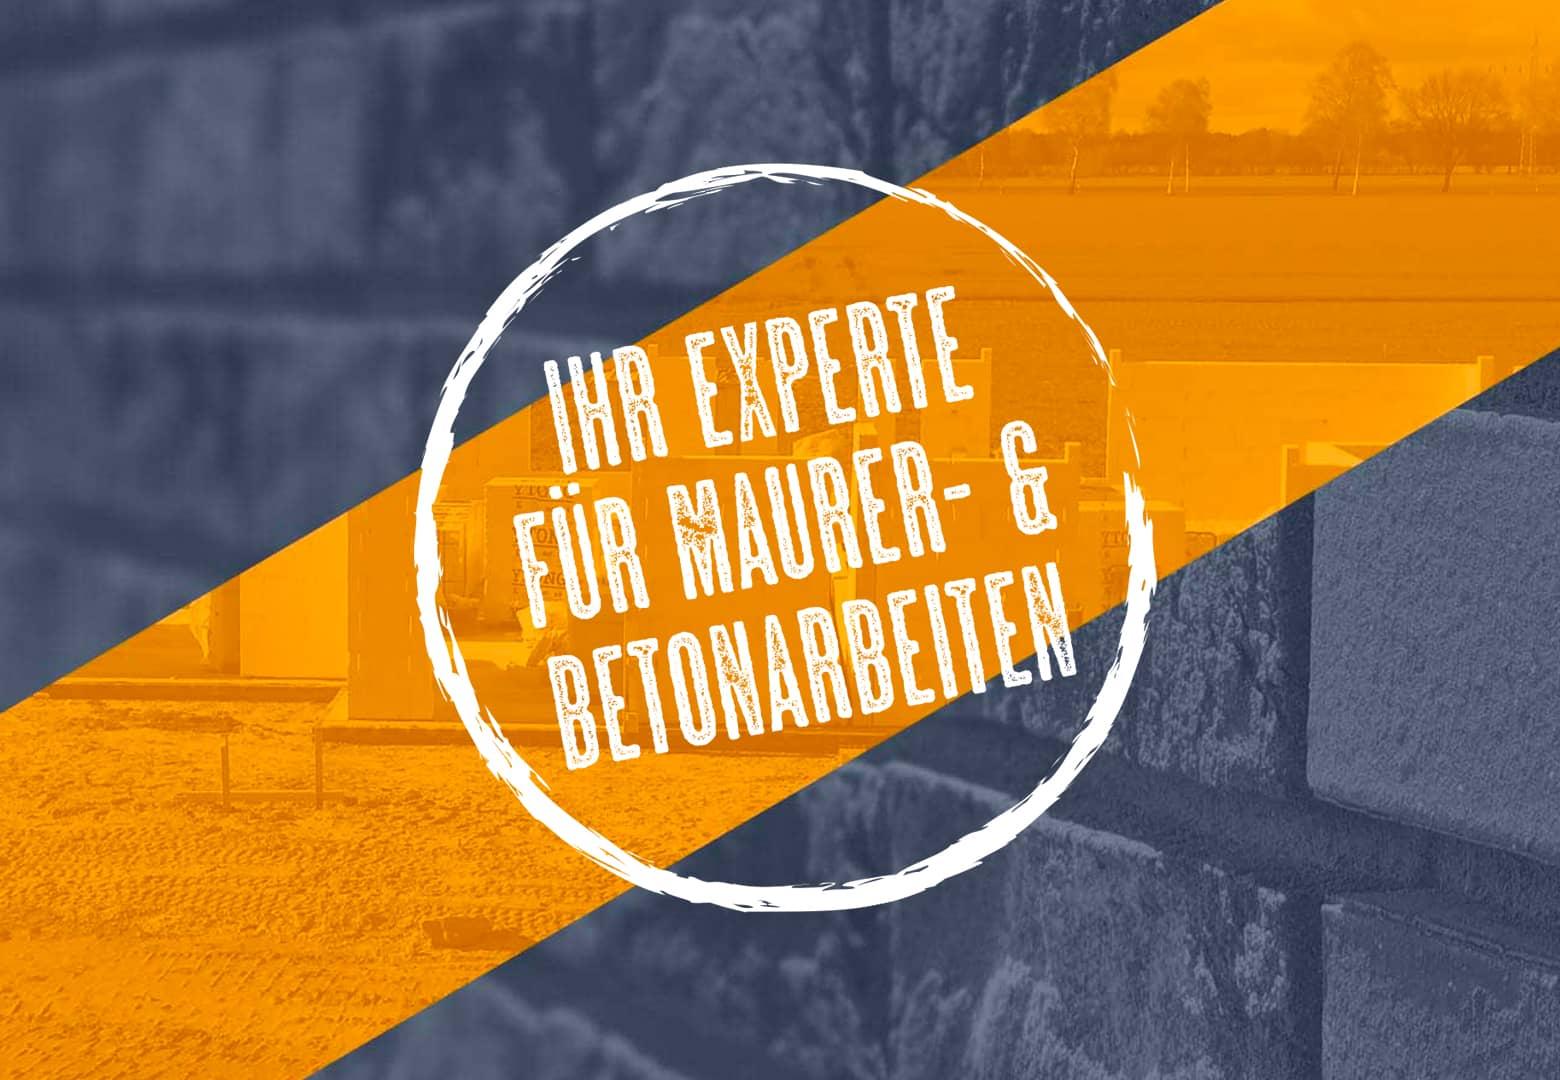 HD Massivhaus Bau GmbH & Co. KG